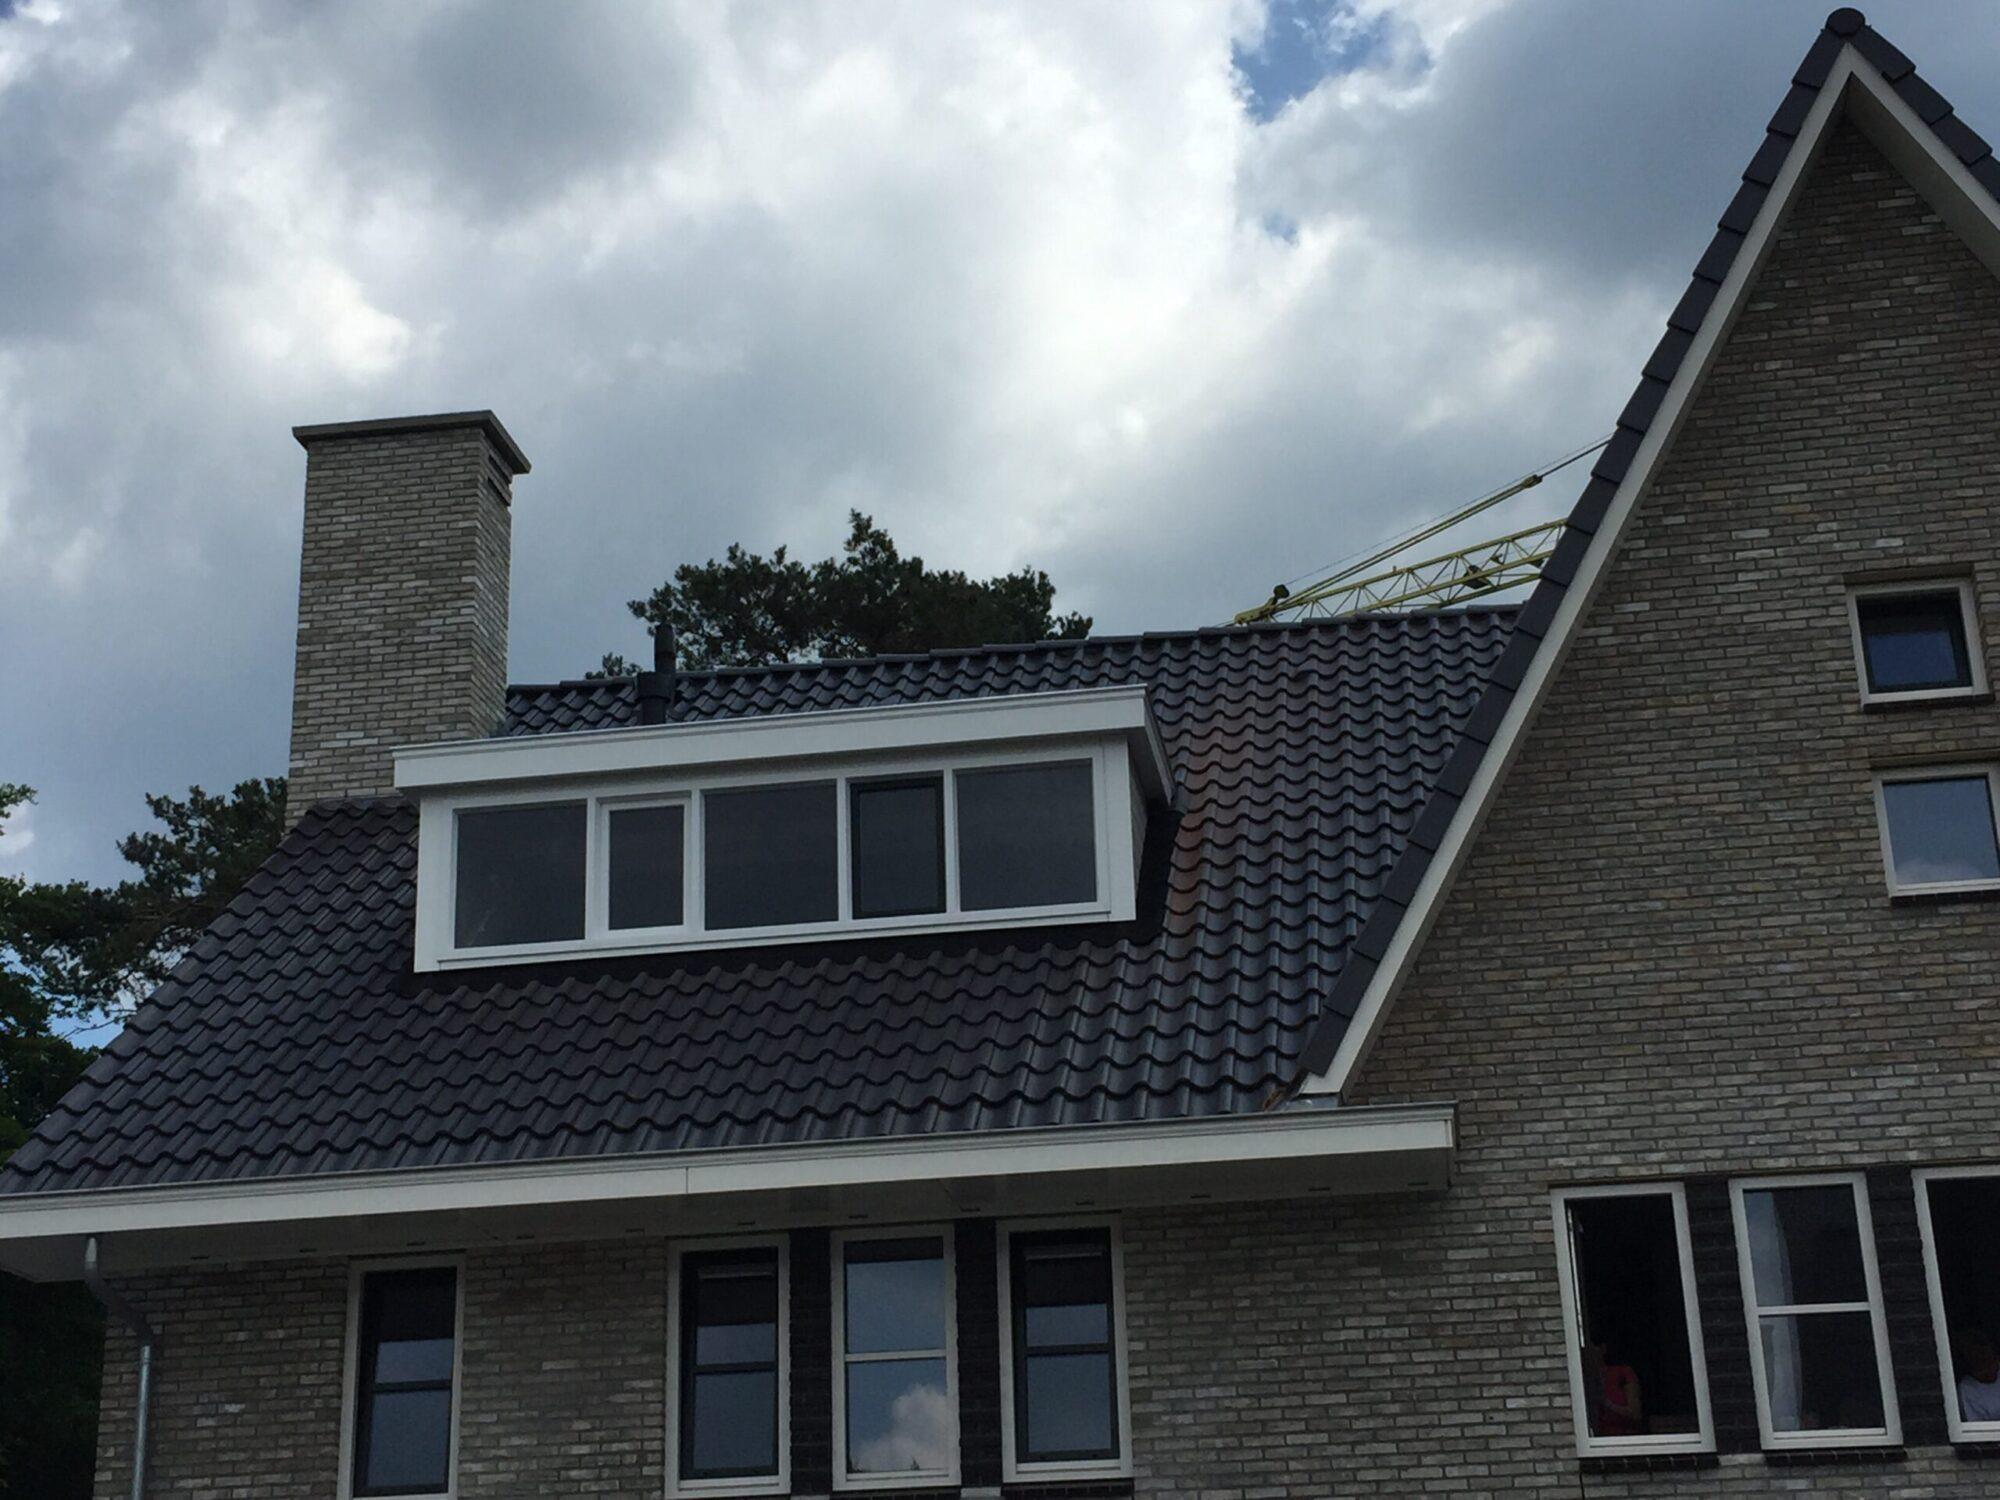 Verhoef-Dakramen-project-Dakkapel met sierlijst te Zeist649380